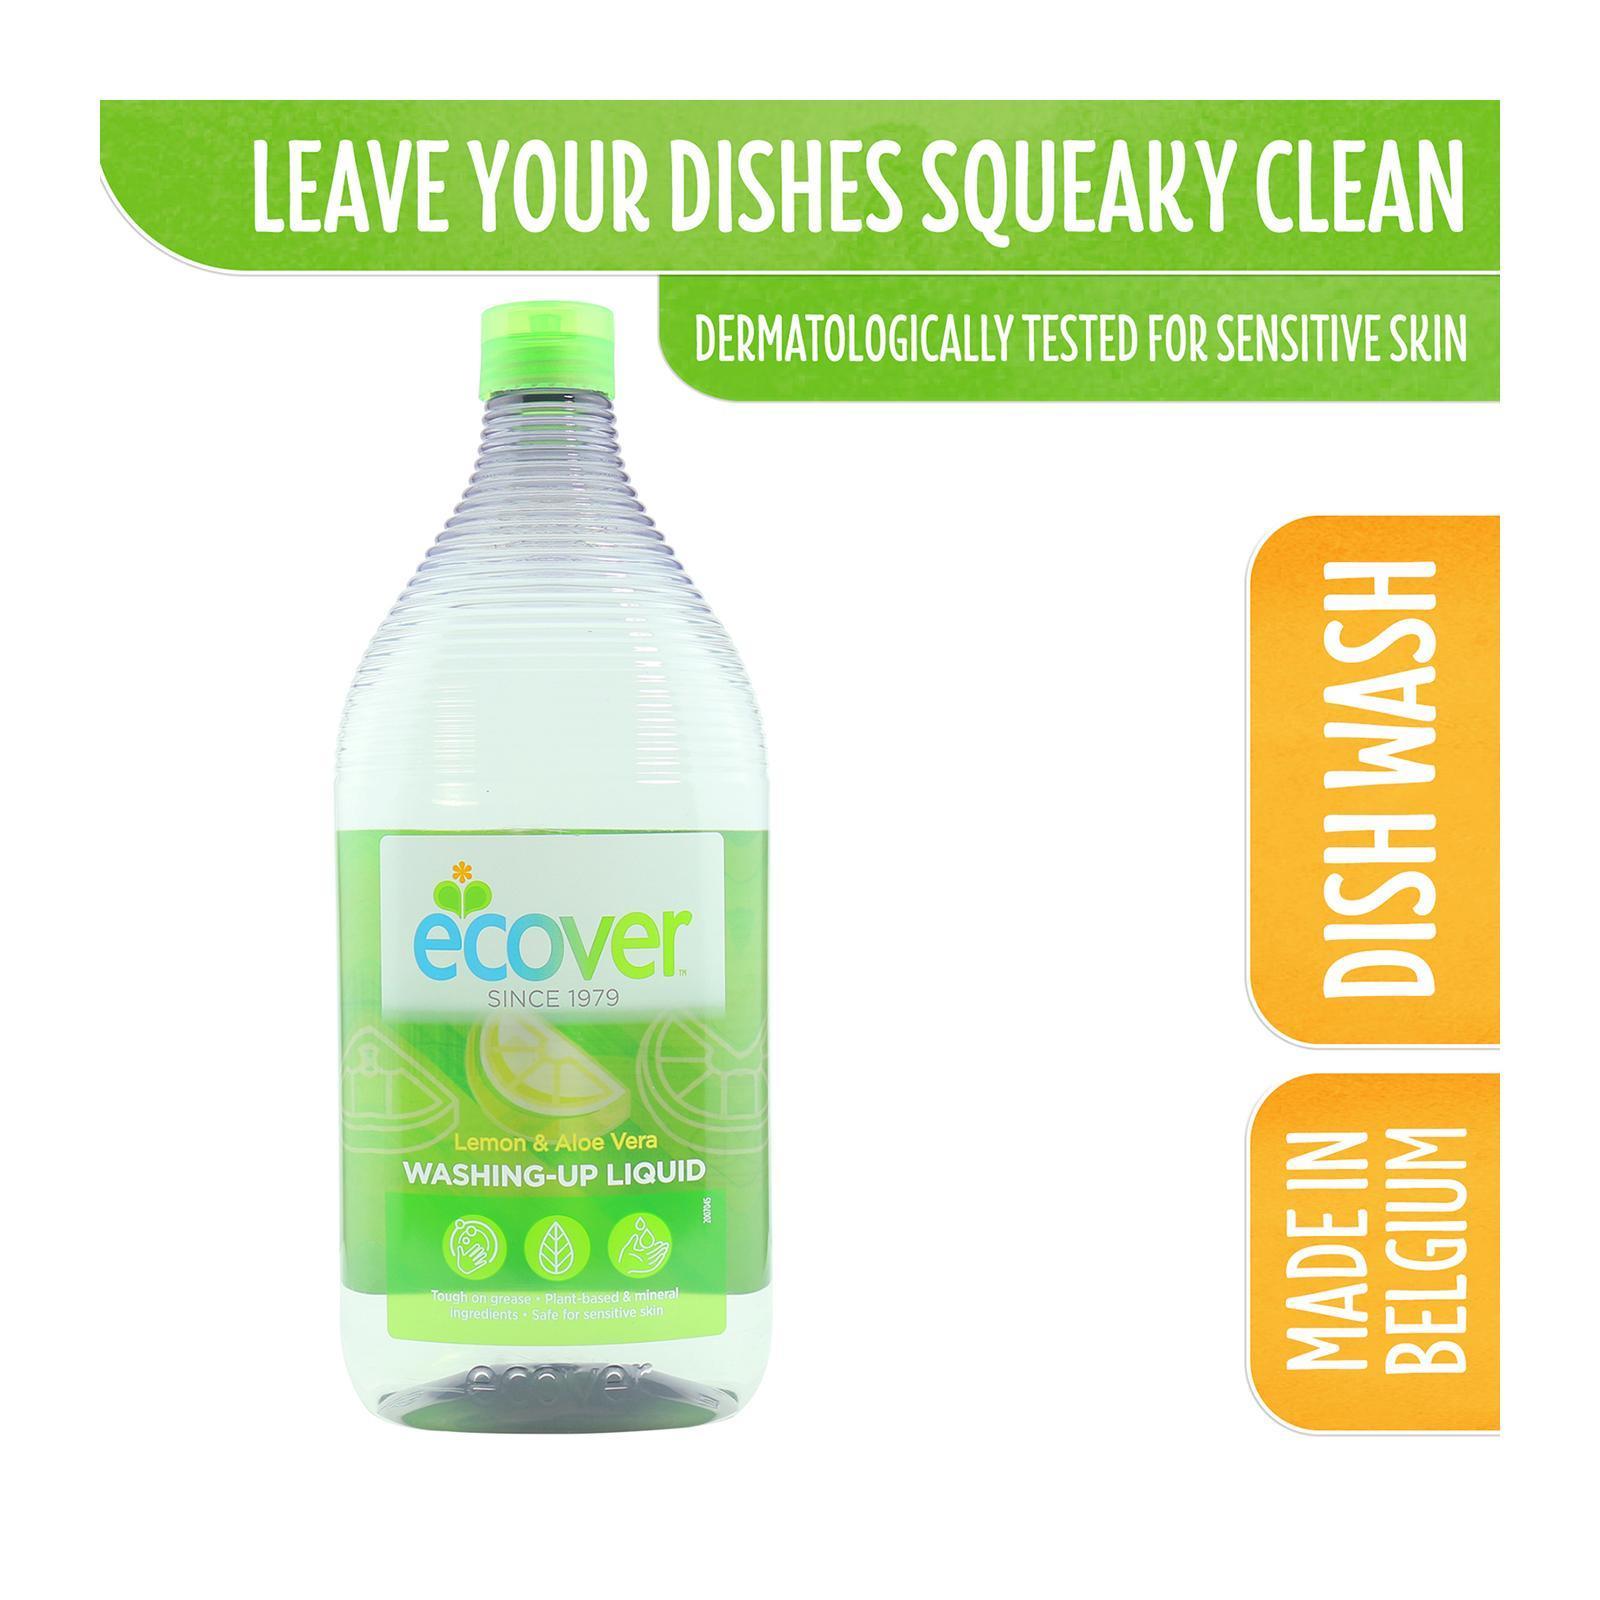 Ecover Washing Up Liquid Lemon And Aloe Vera - By Corlison